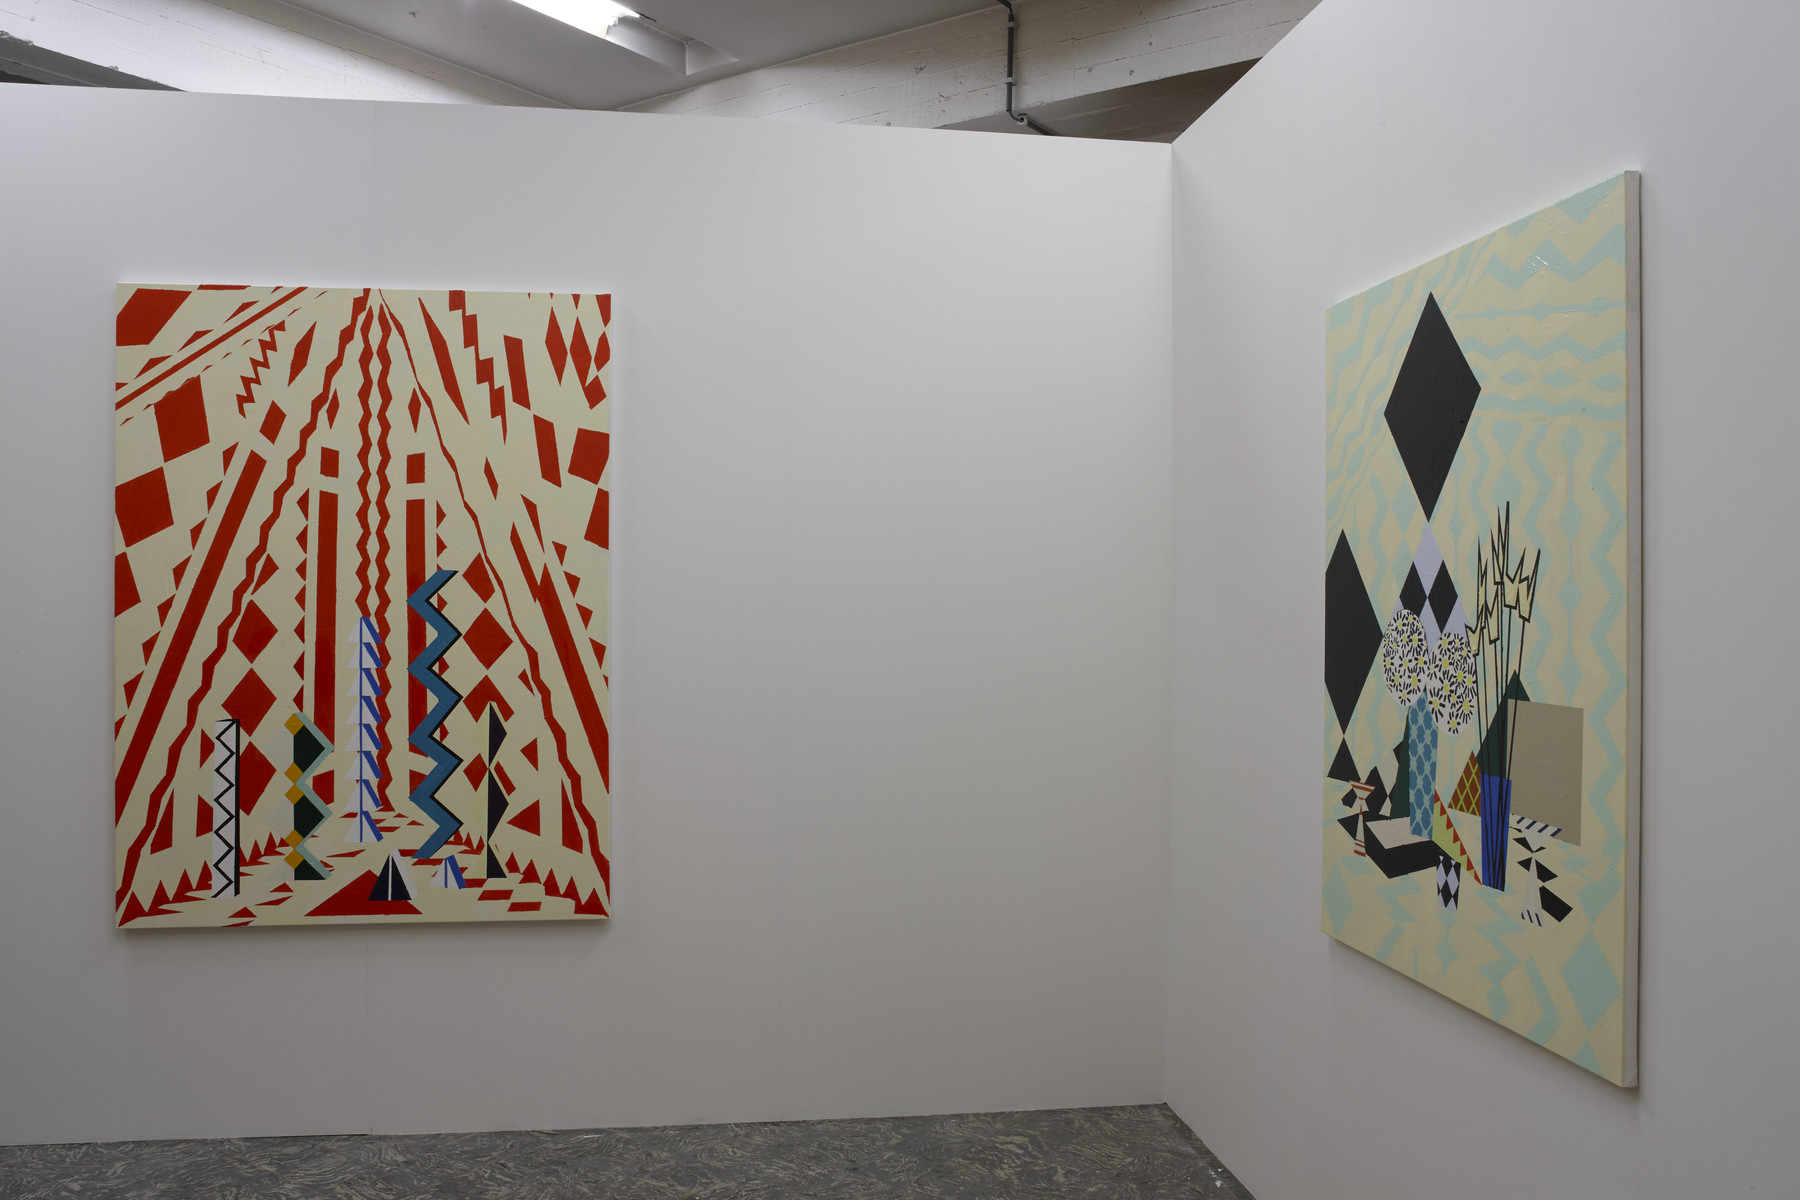 Farah Atassi, 'Zig-Zag', 2015, 'Interior with Tulips and Daisies', 2015, in 'Farah Atassi', installation view, Extra City Kunsthal, 2015 © Jan Kempenaers